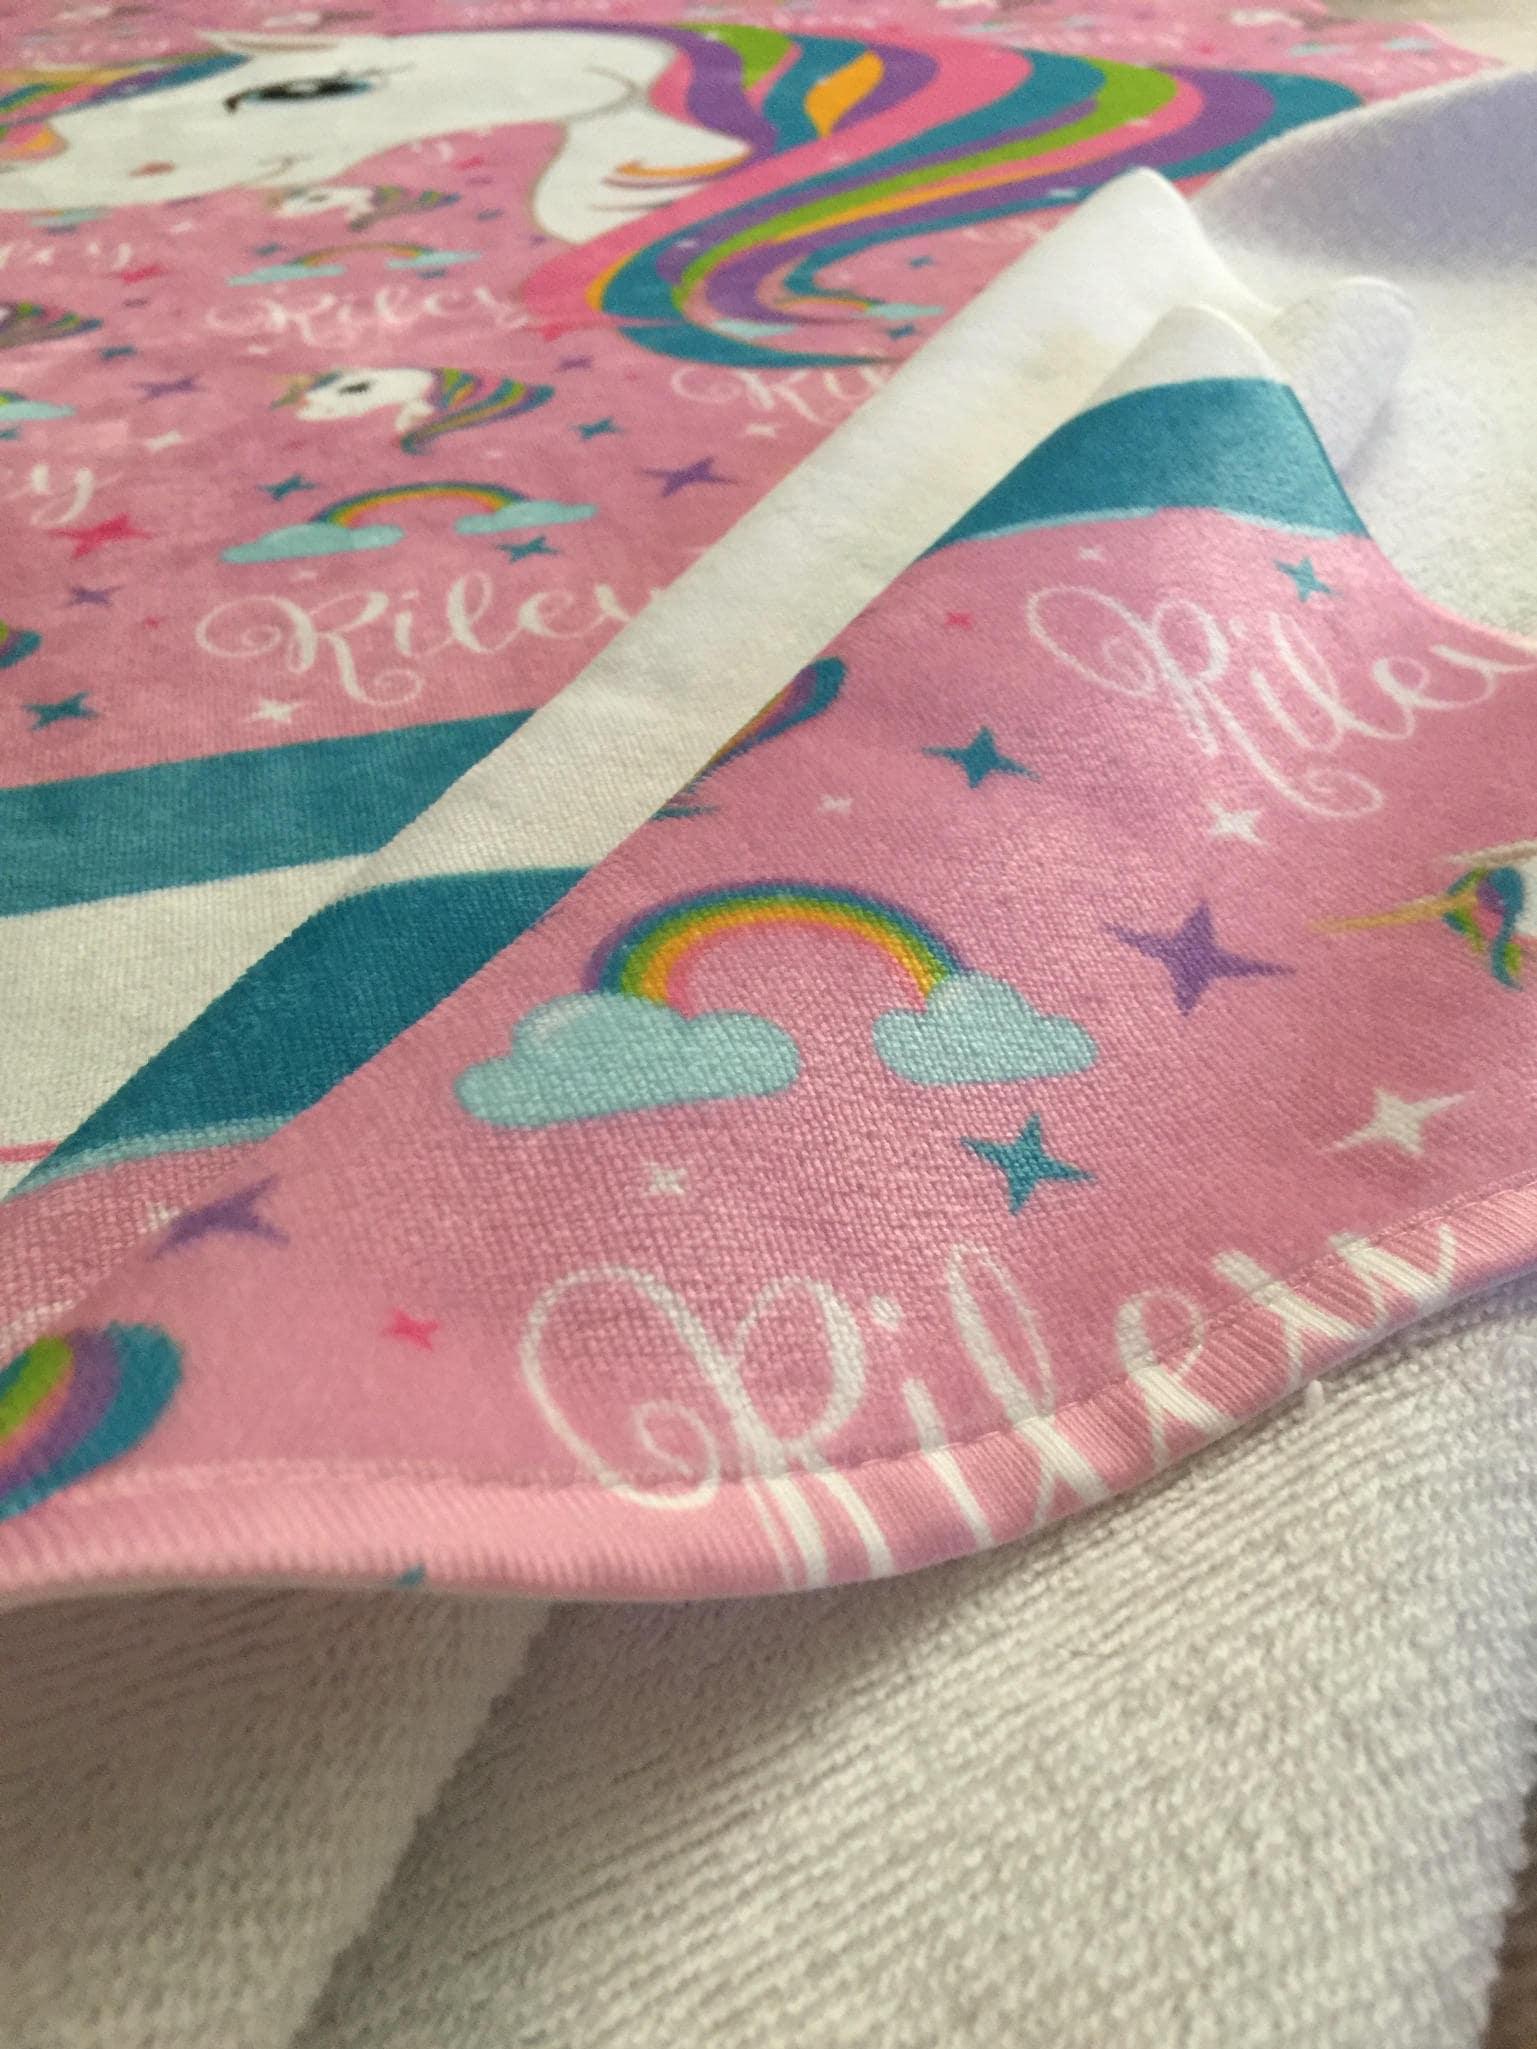 Personalized Unicorn Beach Towel Monogram Towel Camp